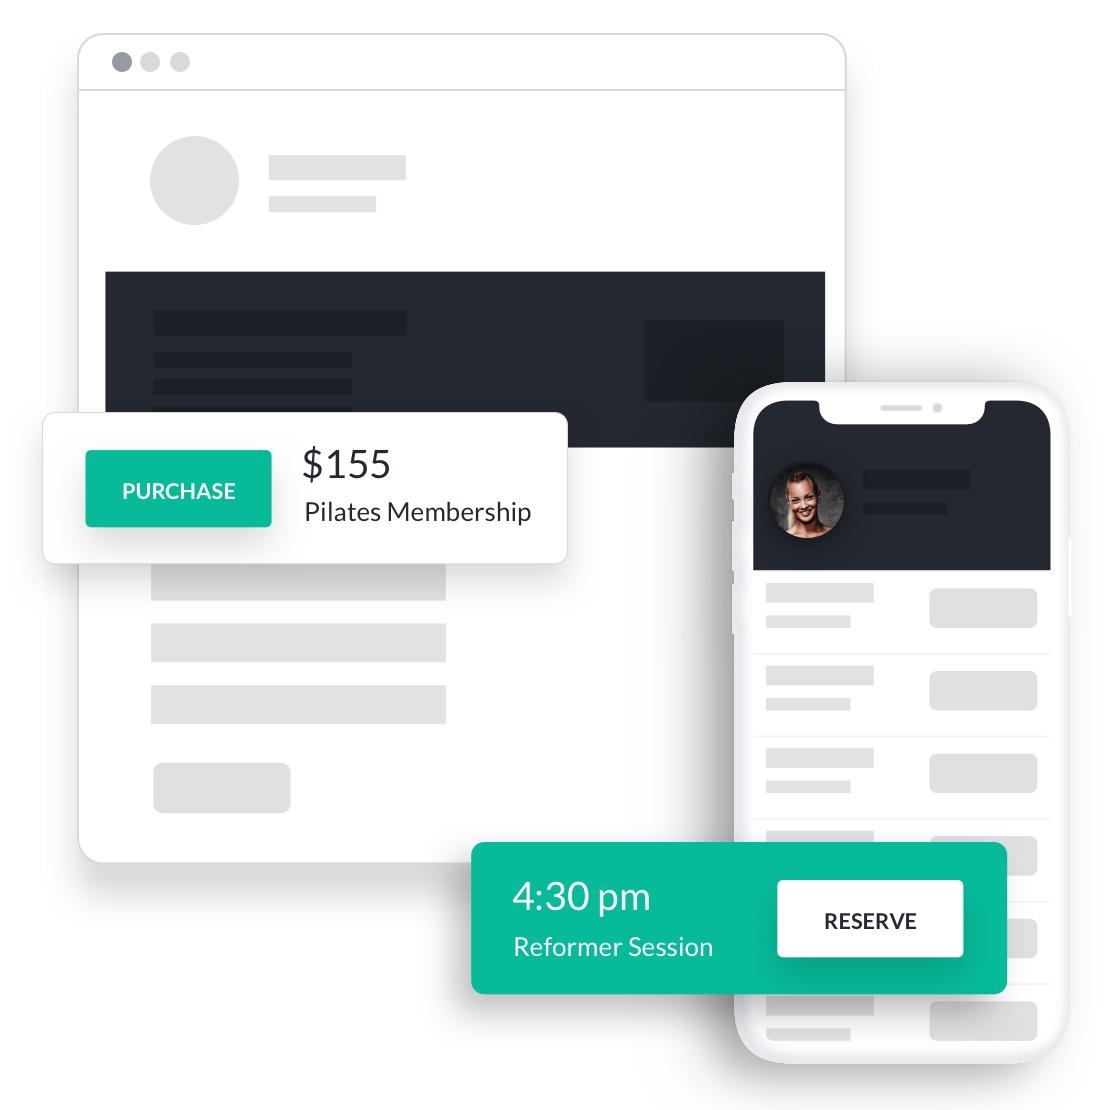 pilates studio software online purchase reserve